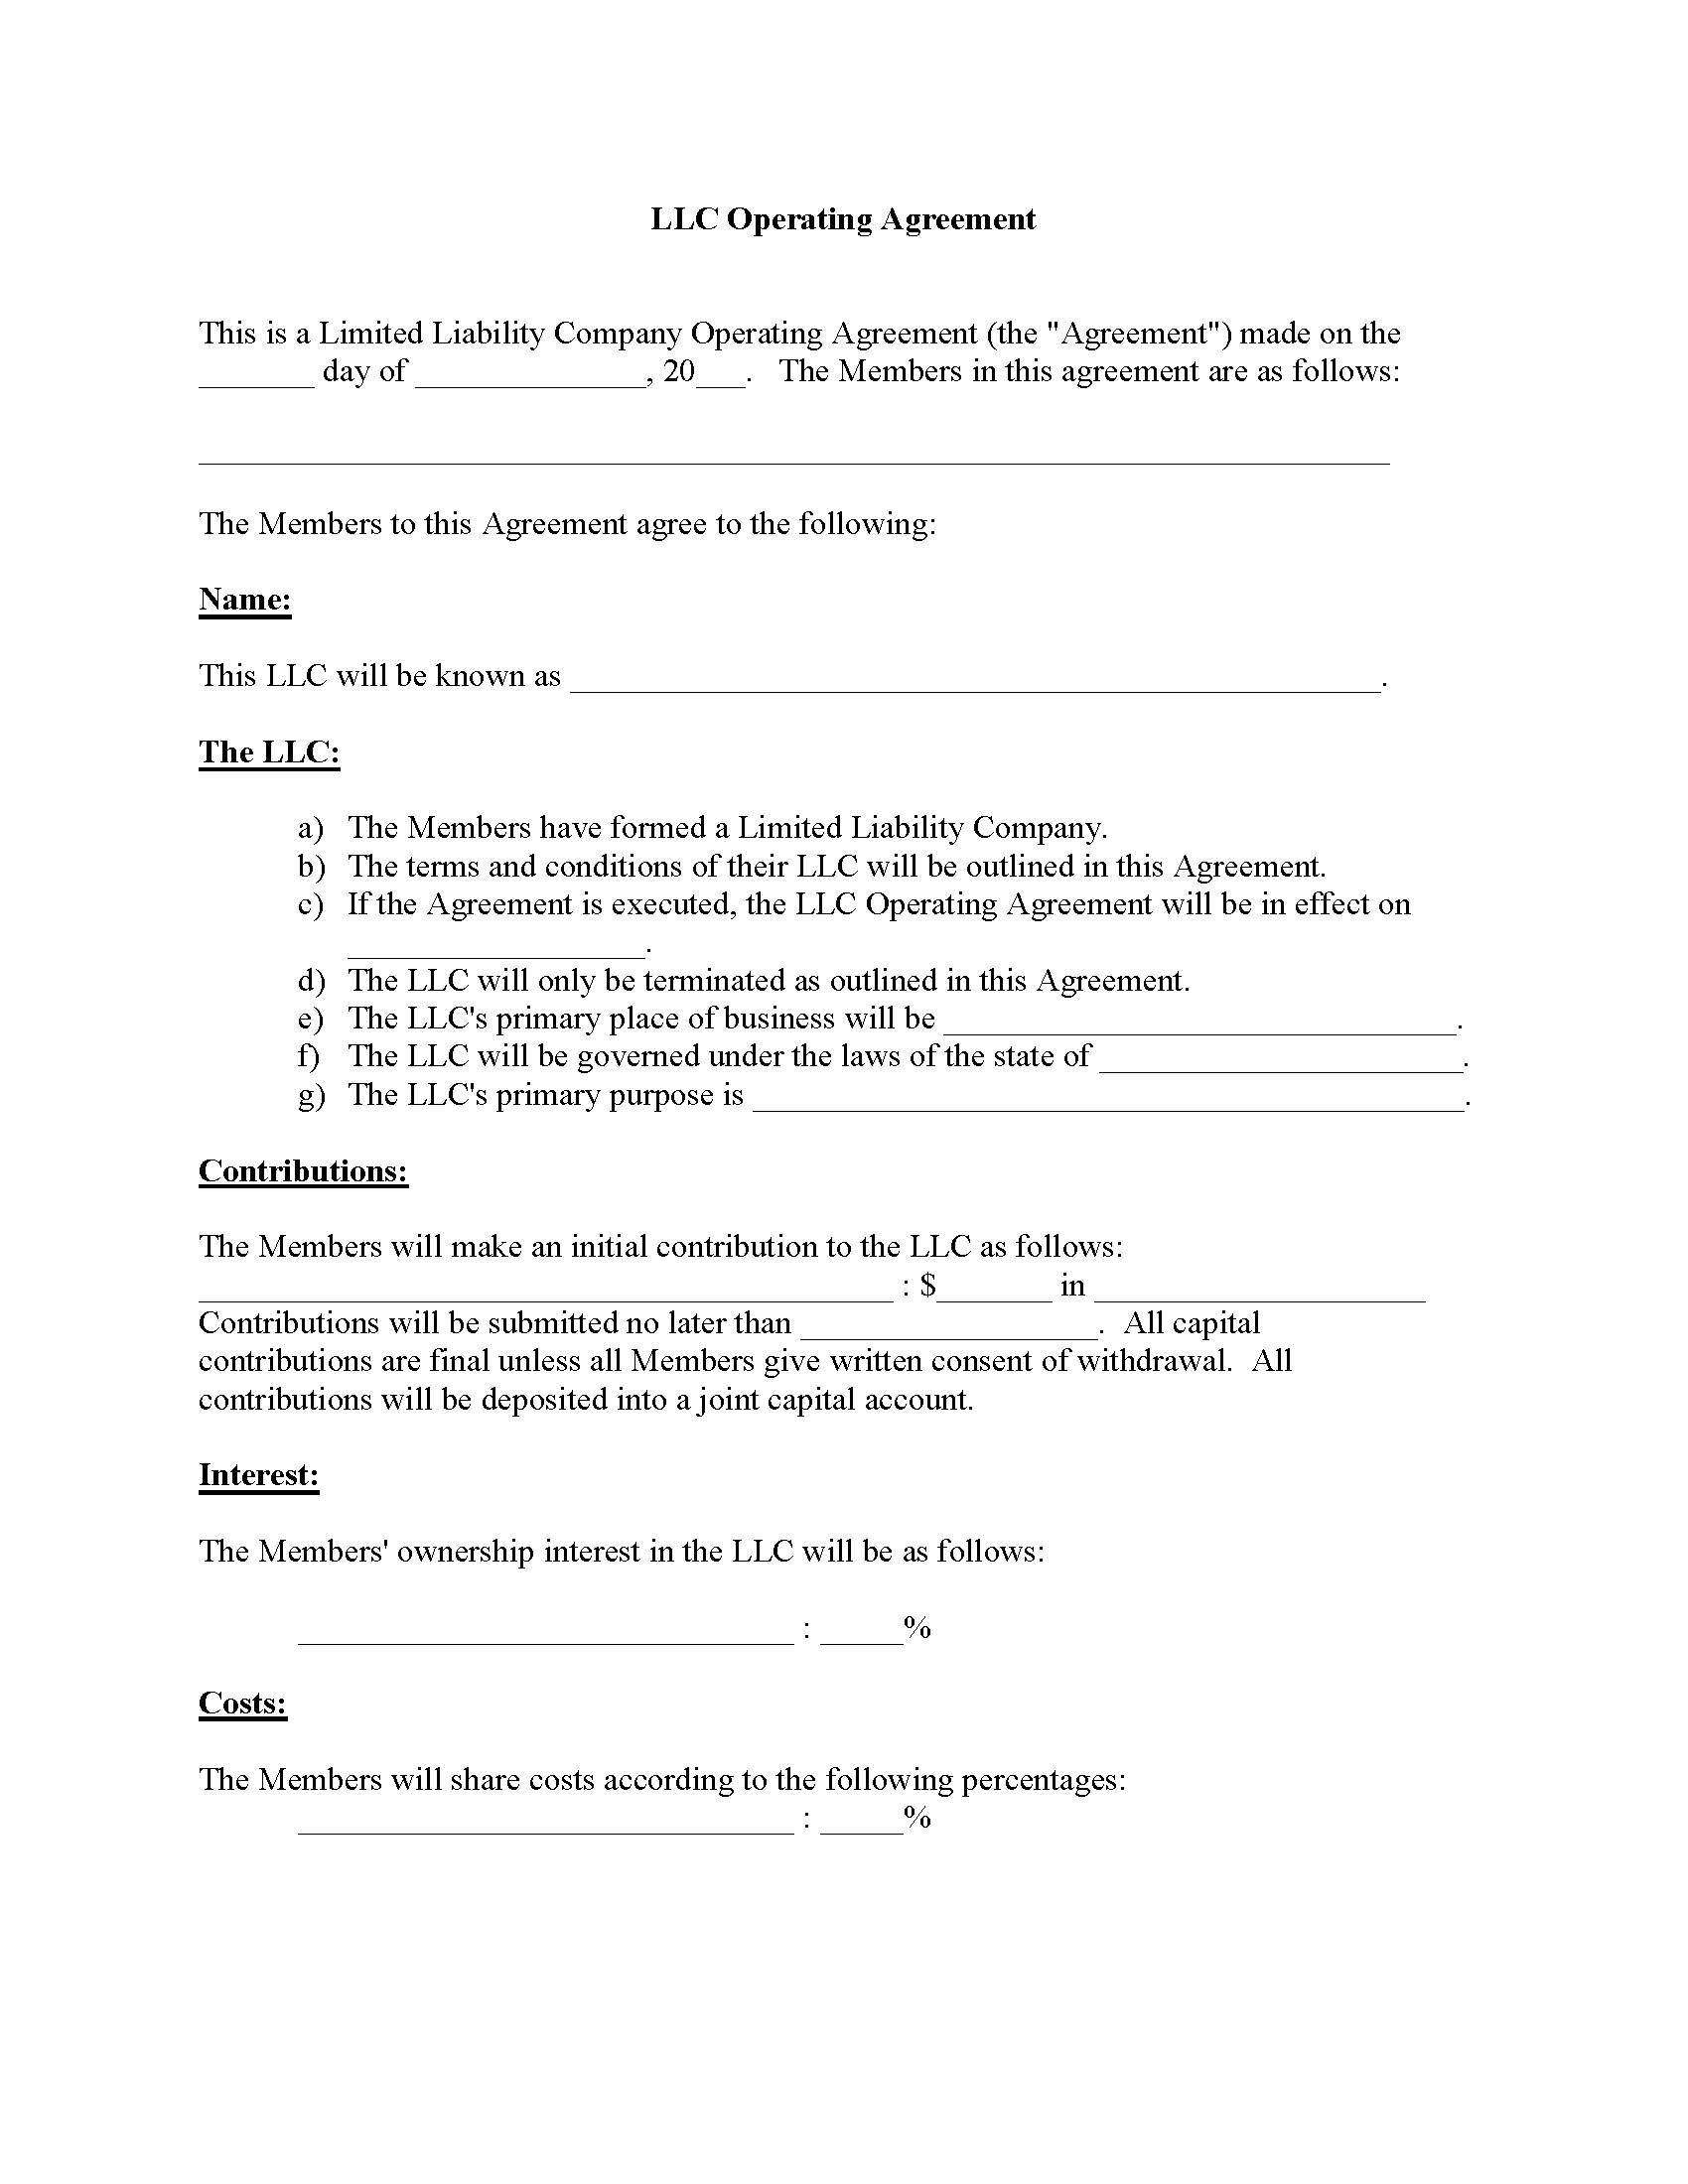 LLC Operating Agreement Form